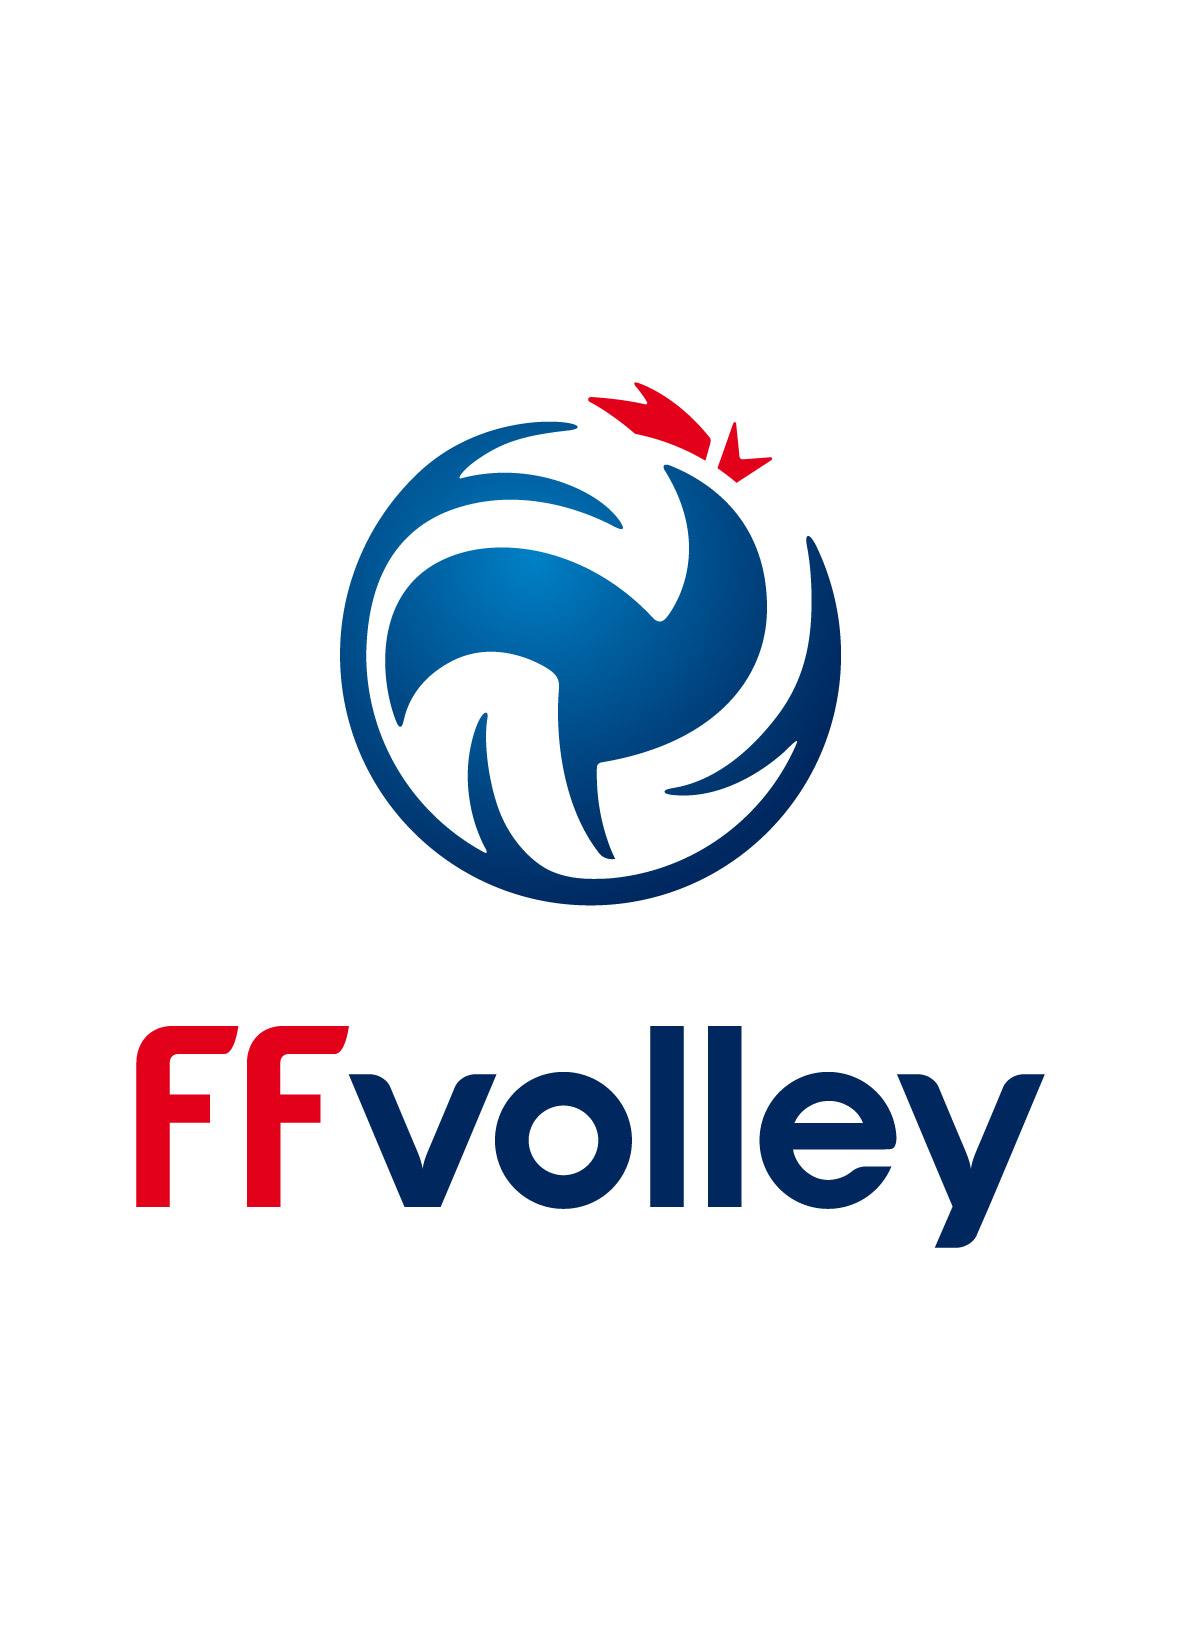 FFvolley